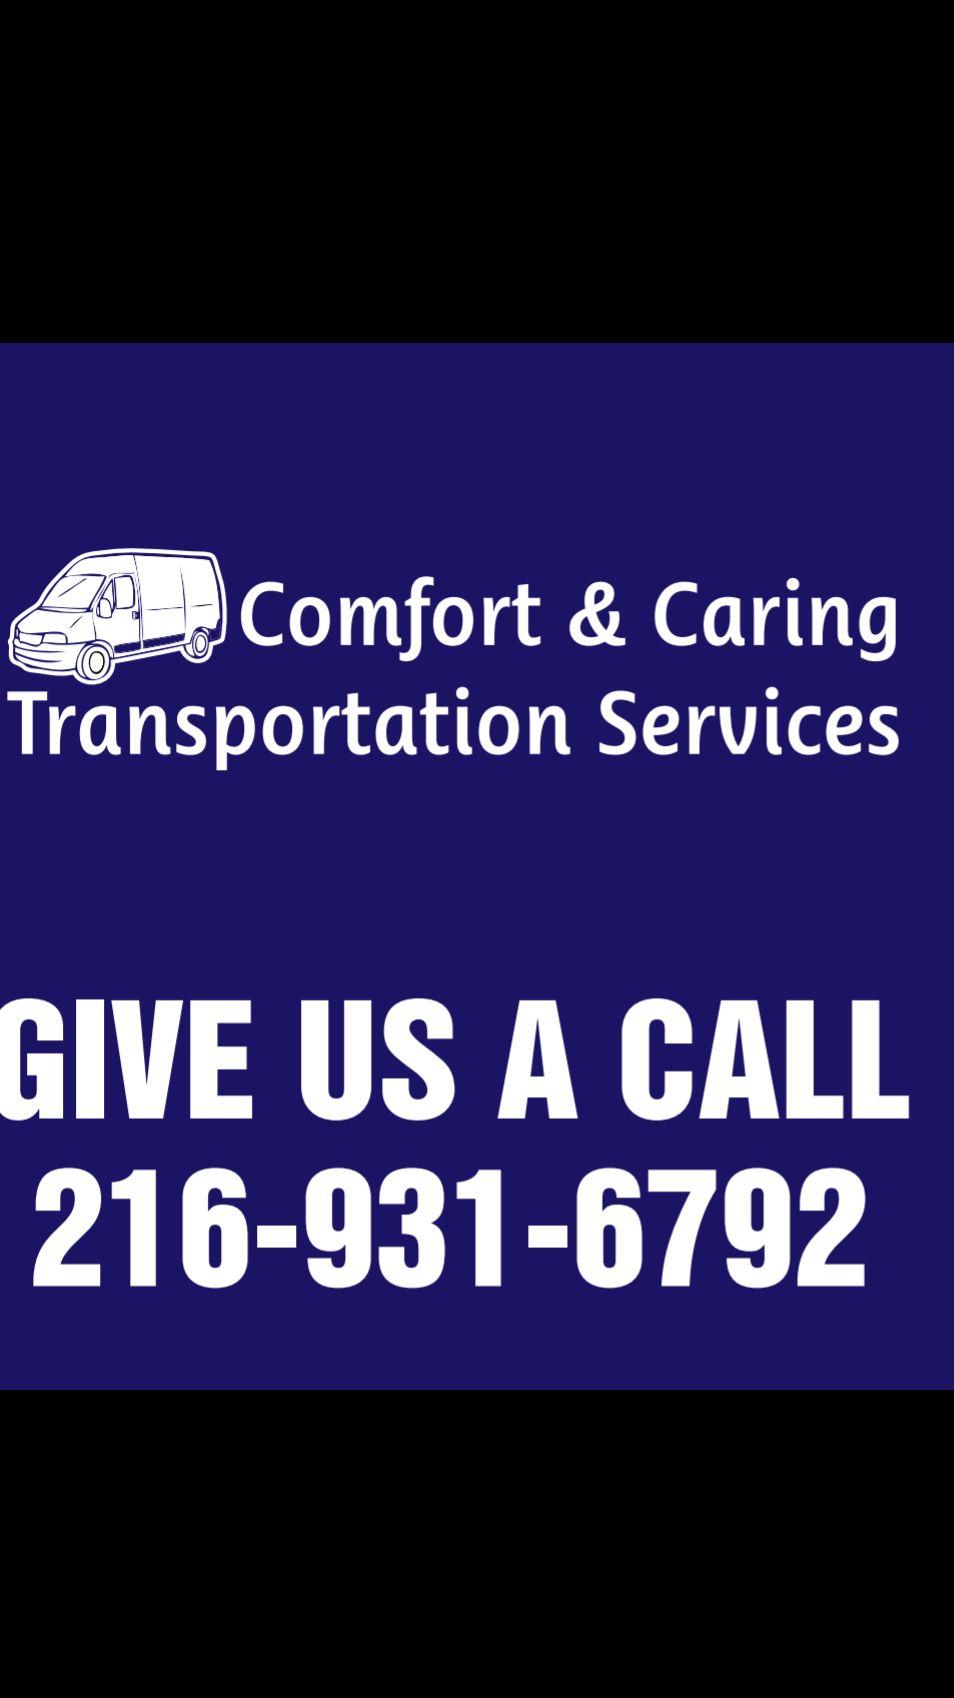 Comfort & Caring Transportation Services LLC image 0